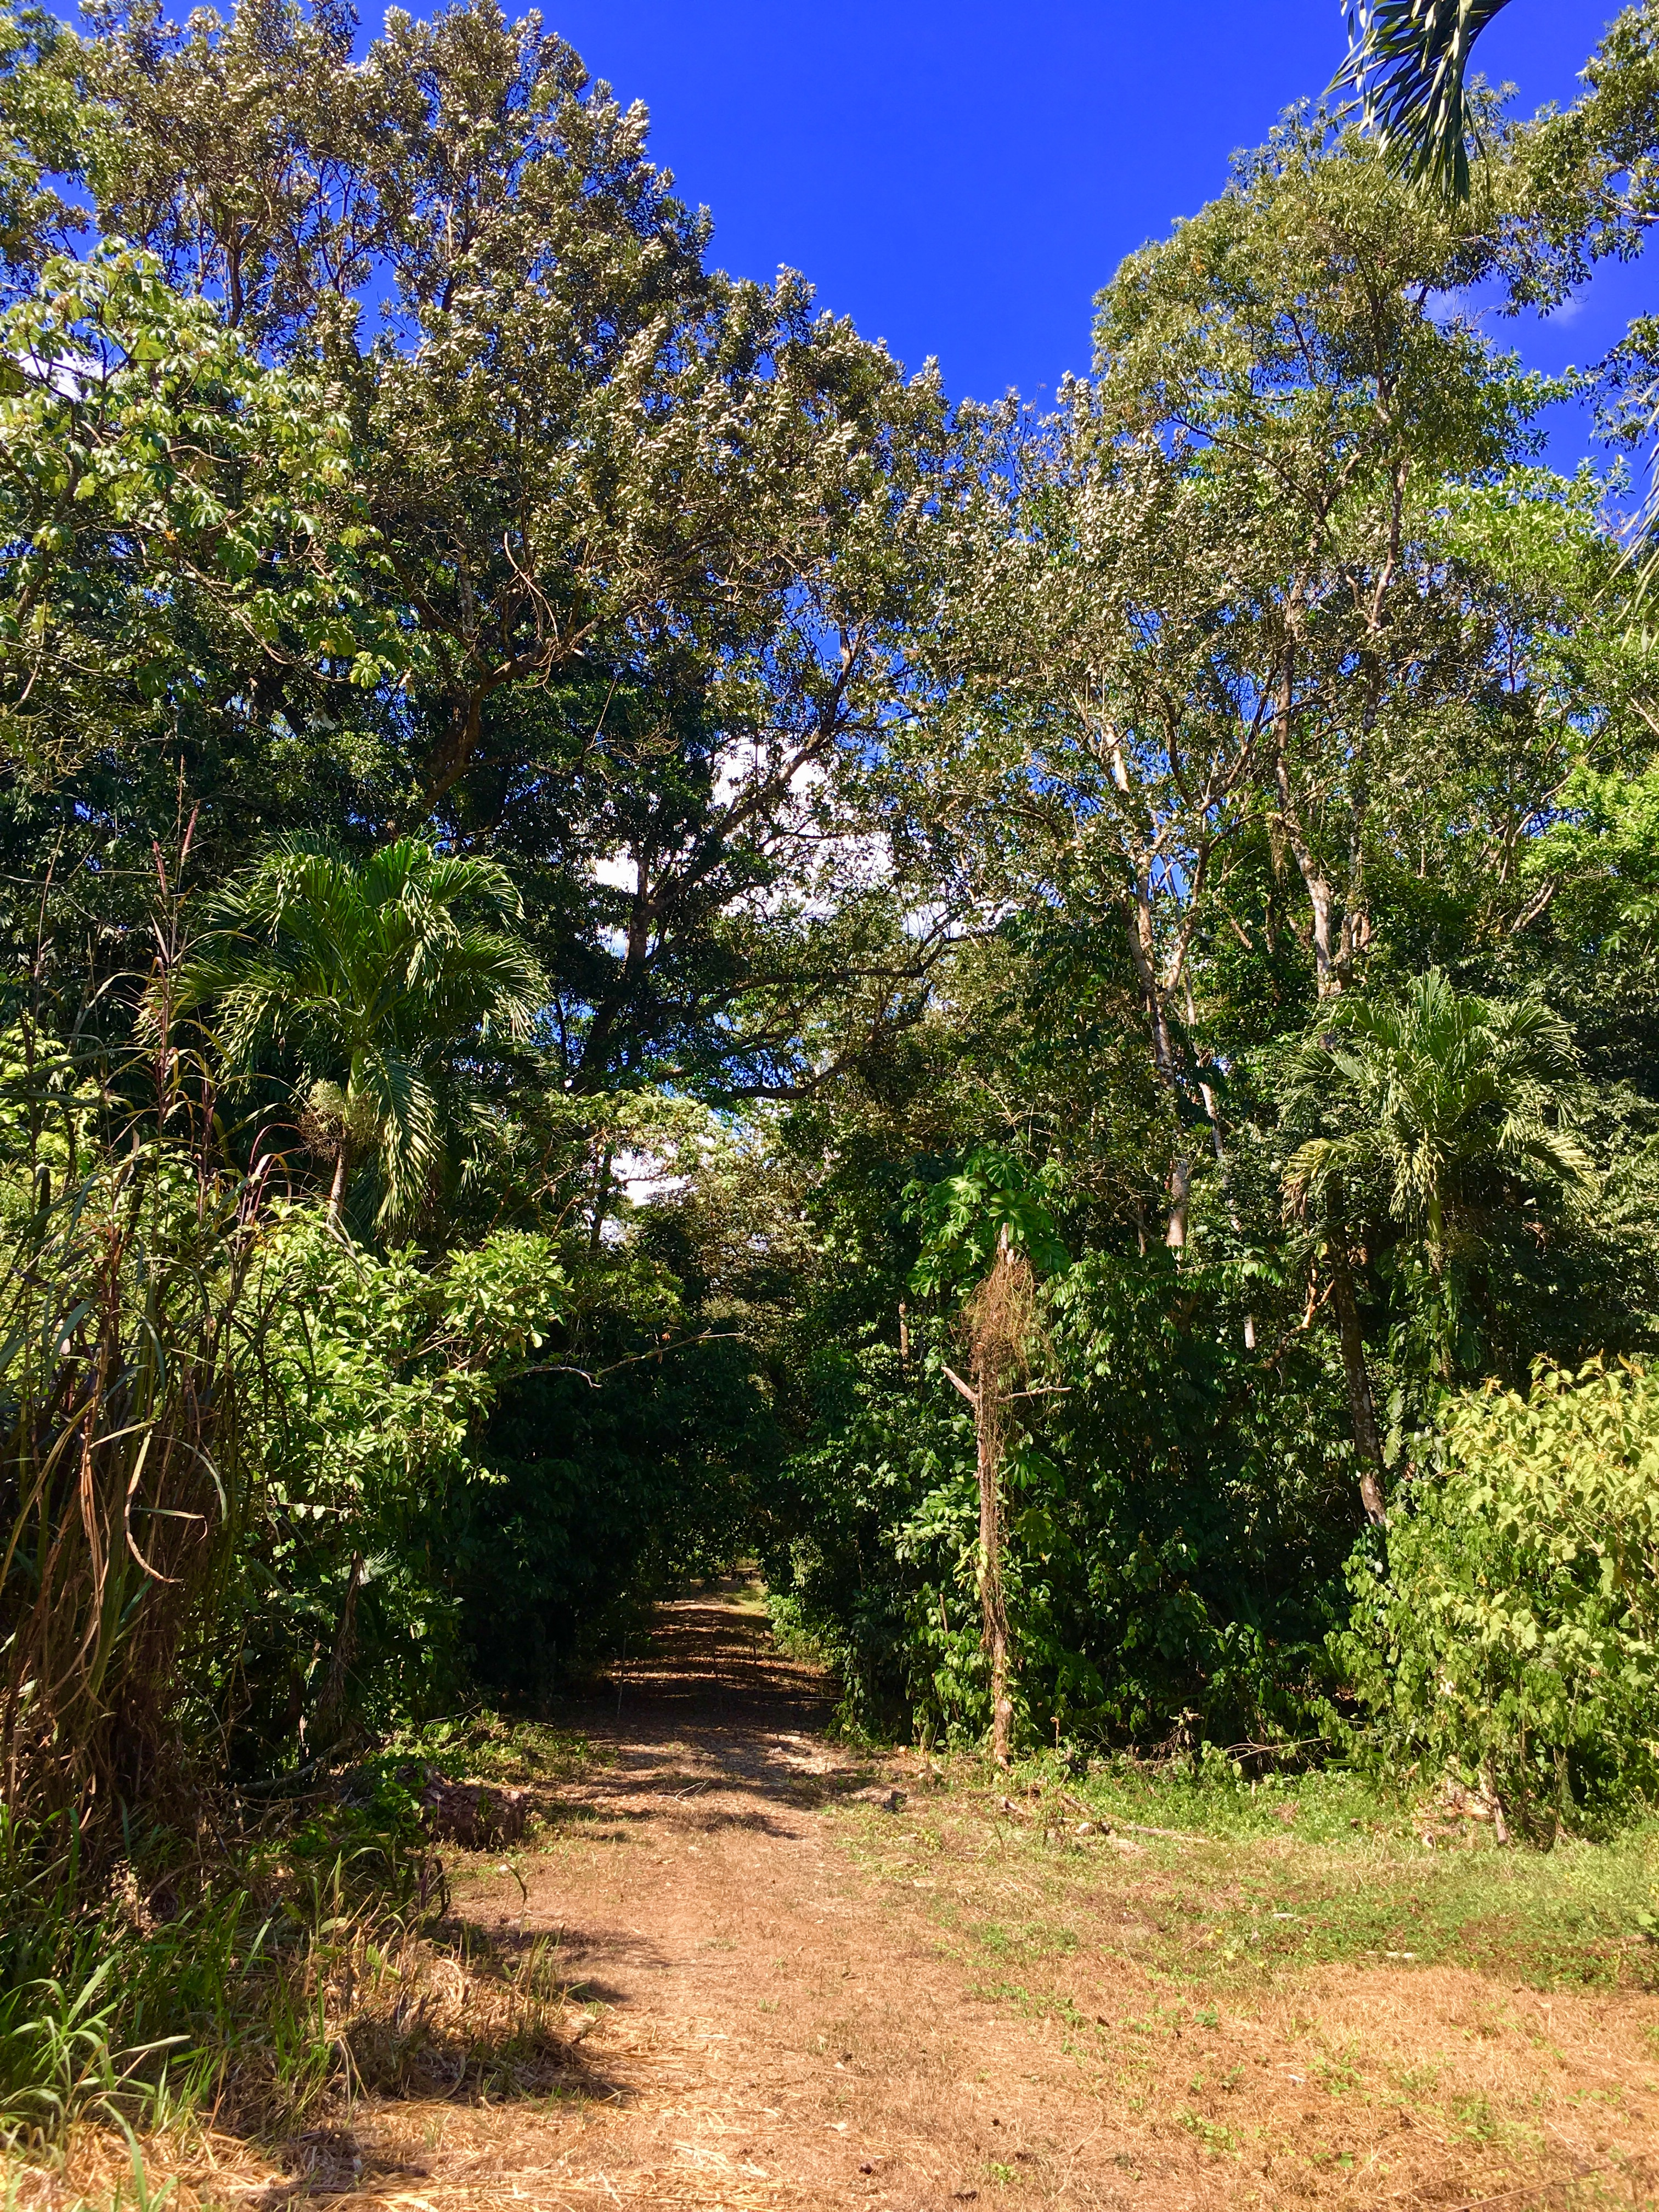 Dominical-Costa-Rica-property-costaricarealestateDOM331-10.jpg